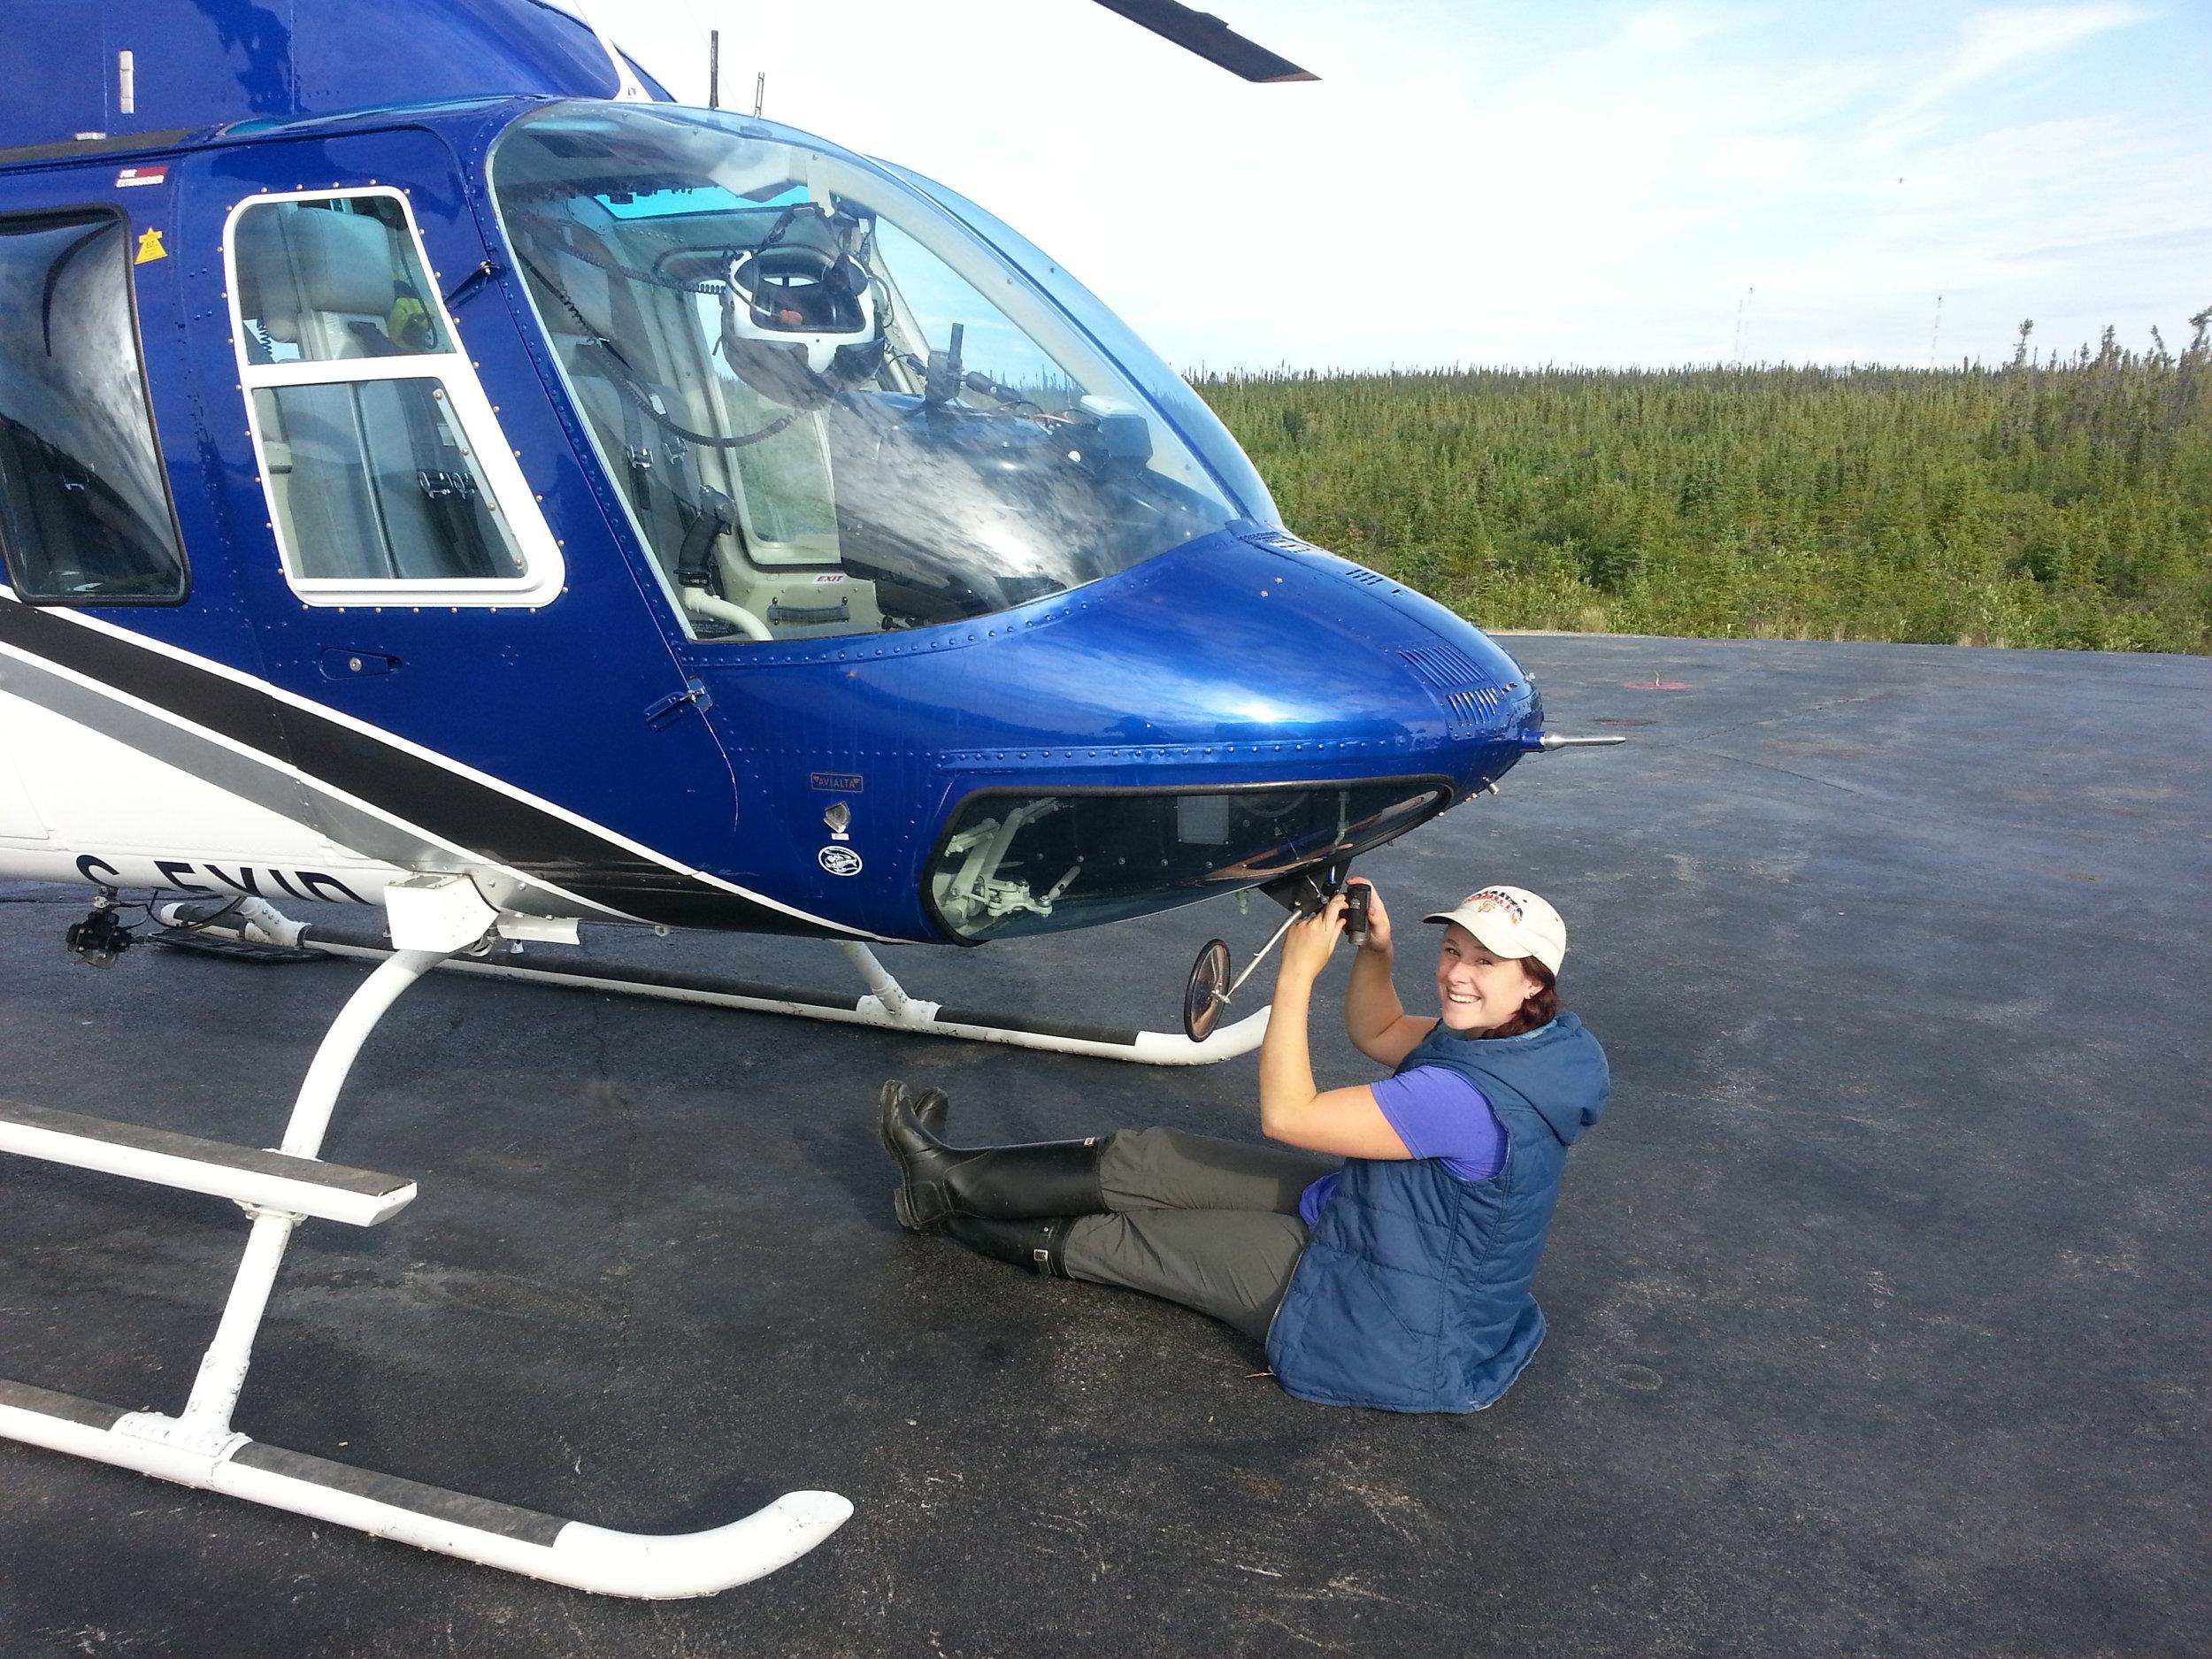 HelicopterContourAlex.jpg